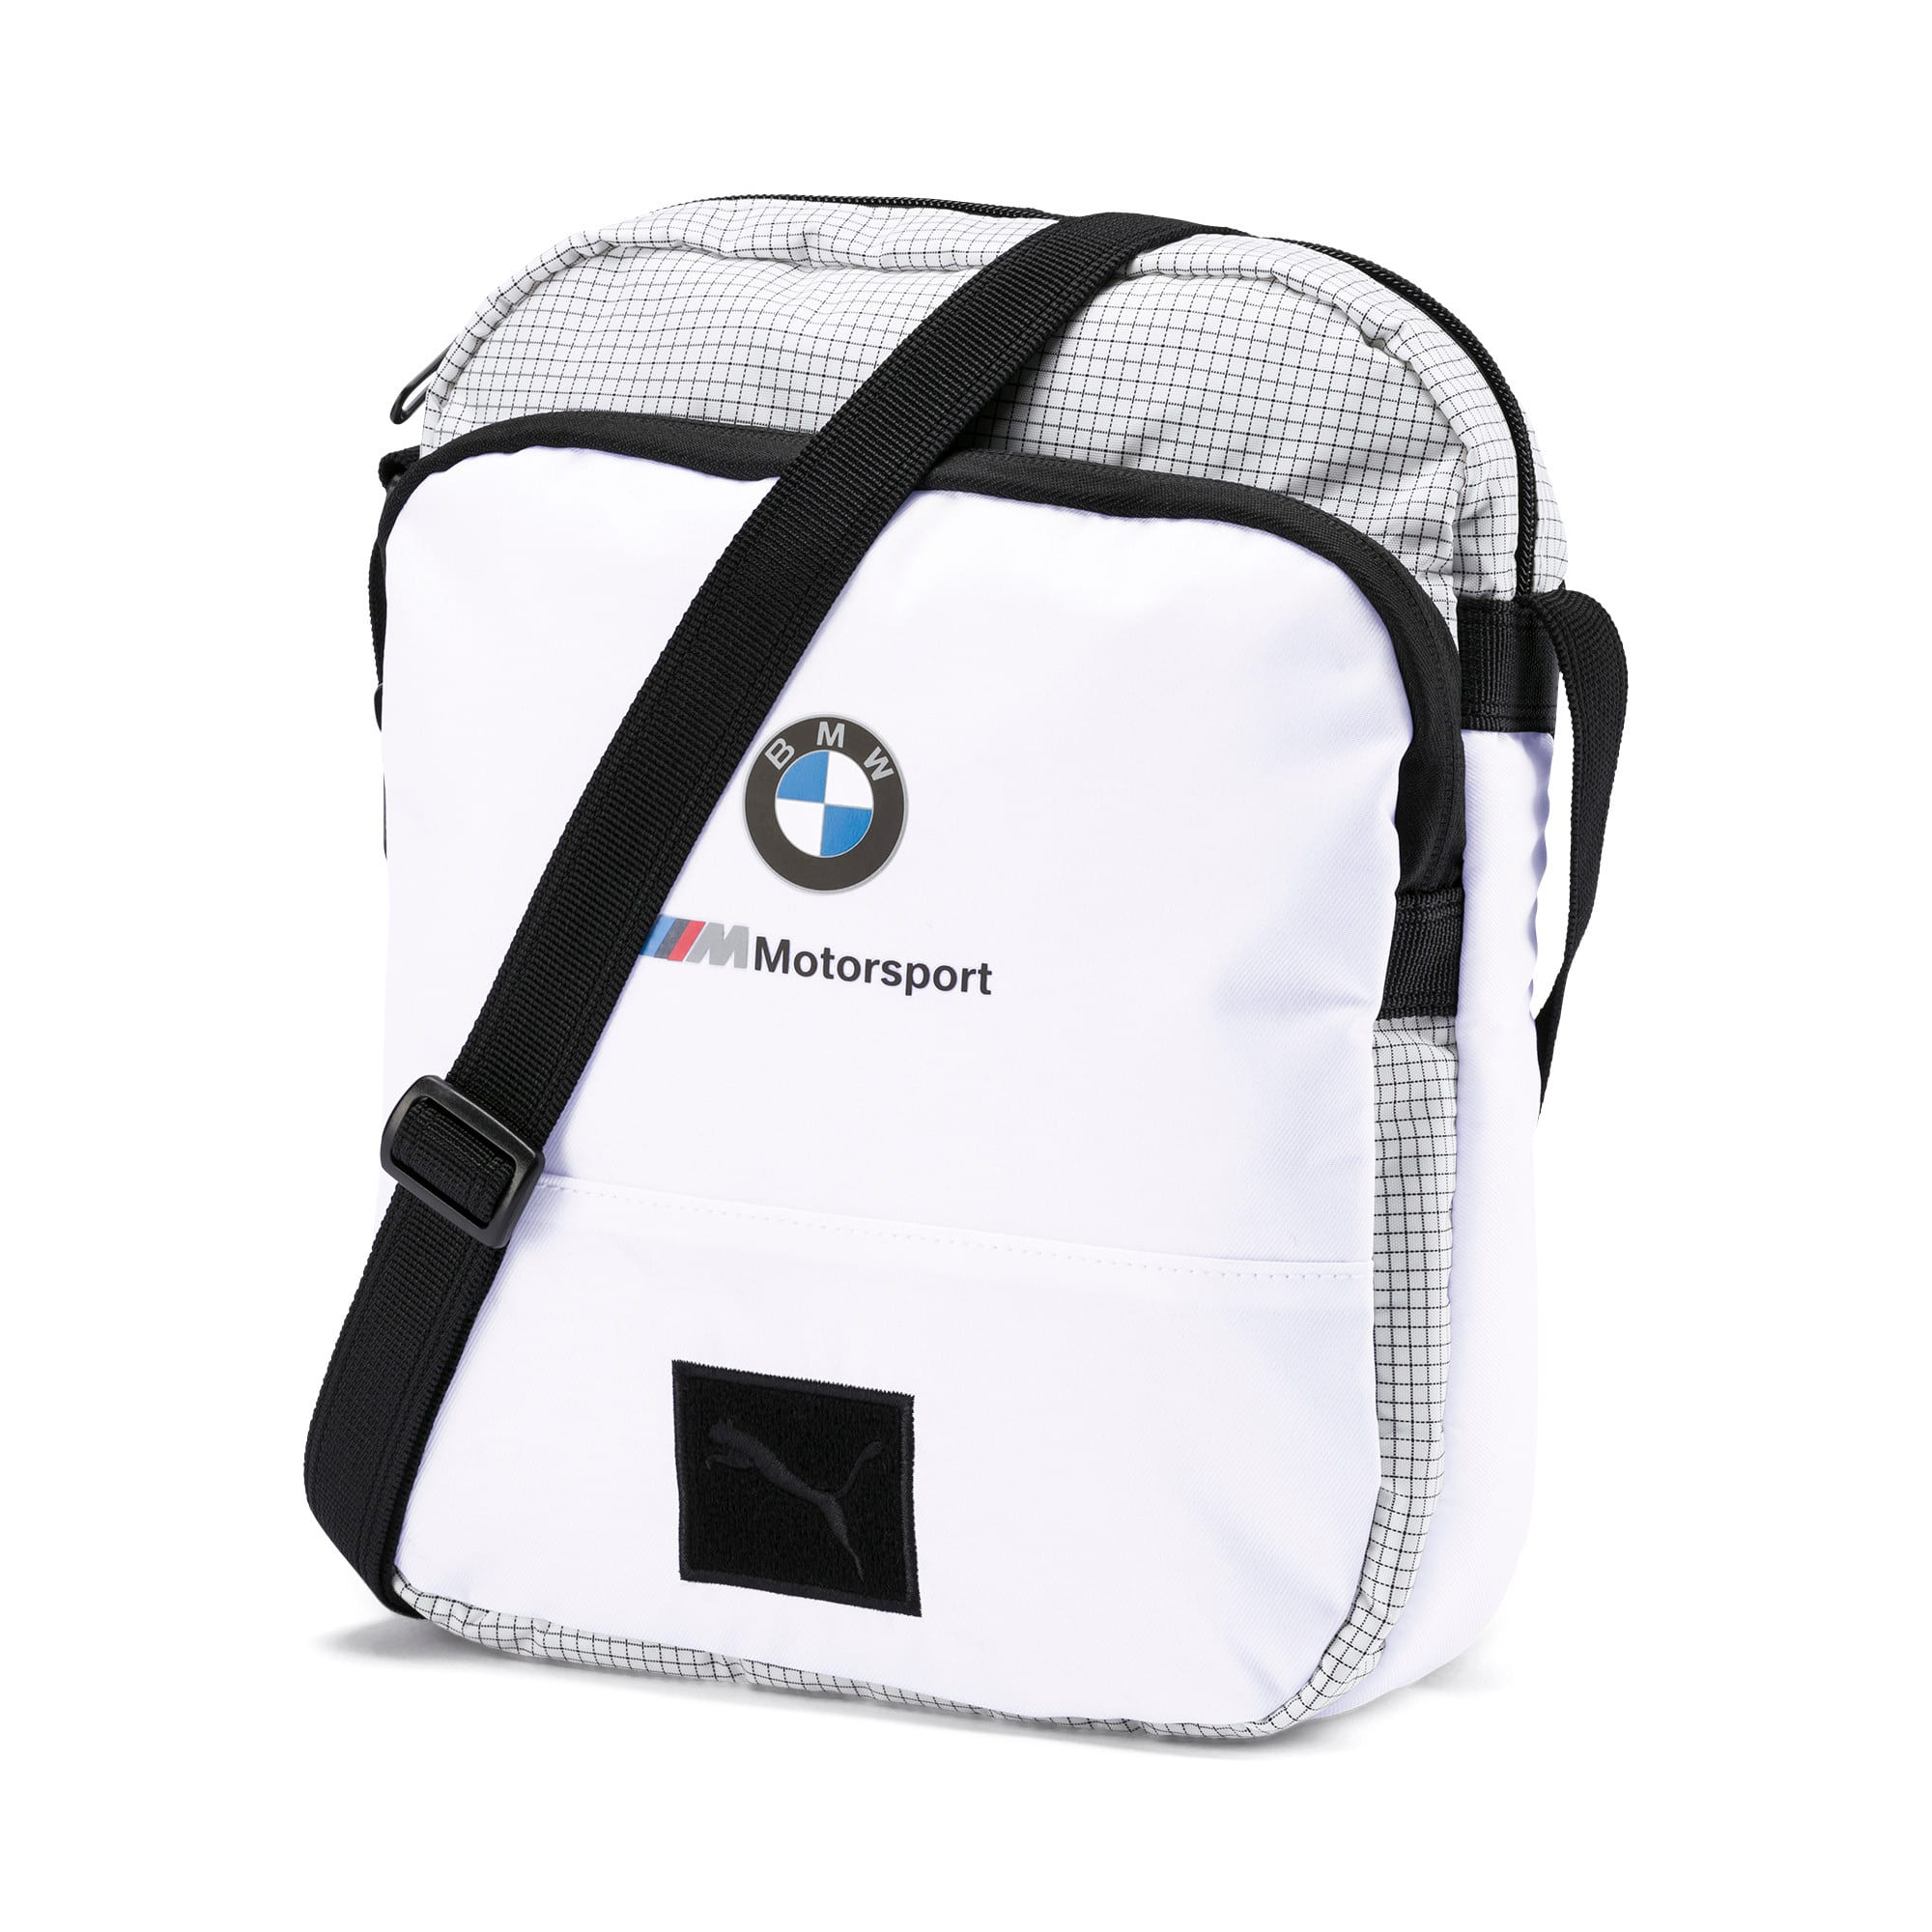 Thumbnail 1 of BMW M Motorsport Portable Bag, Puma White, medium